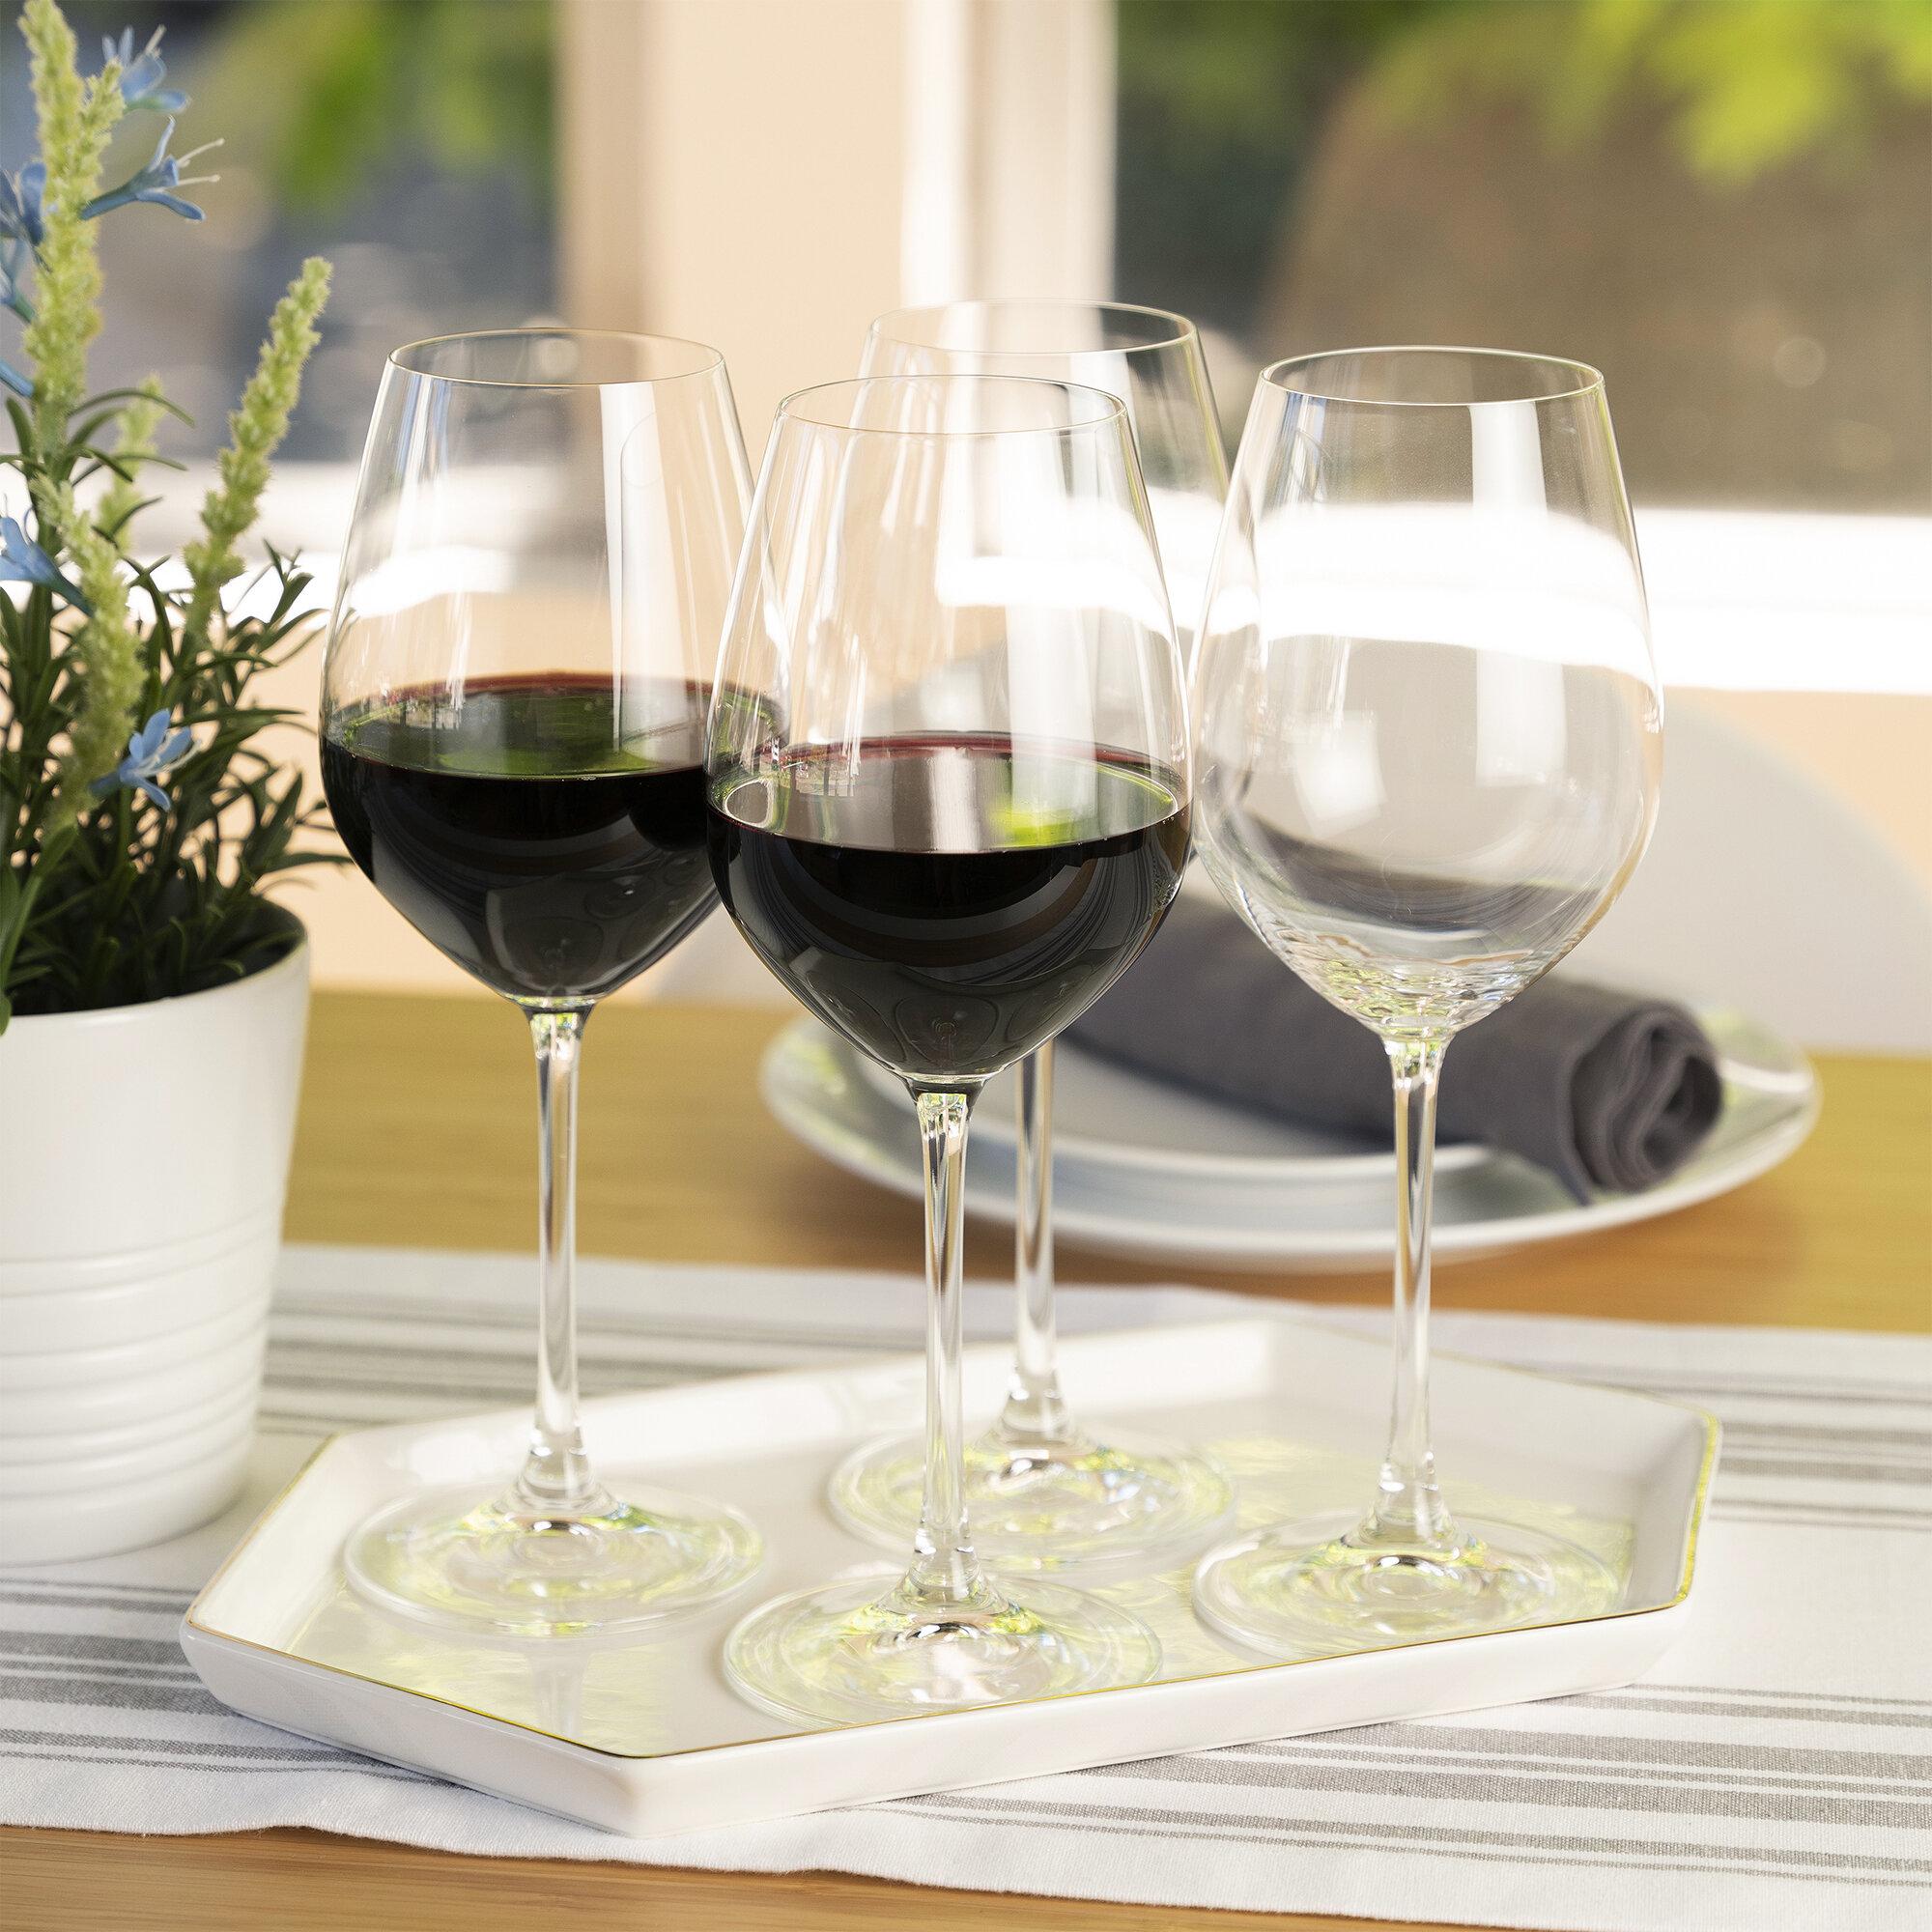 Germany Wine Glasses You Ll Love In 2021 Wayfair